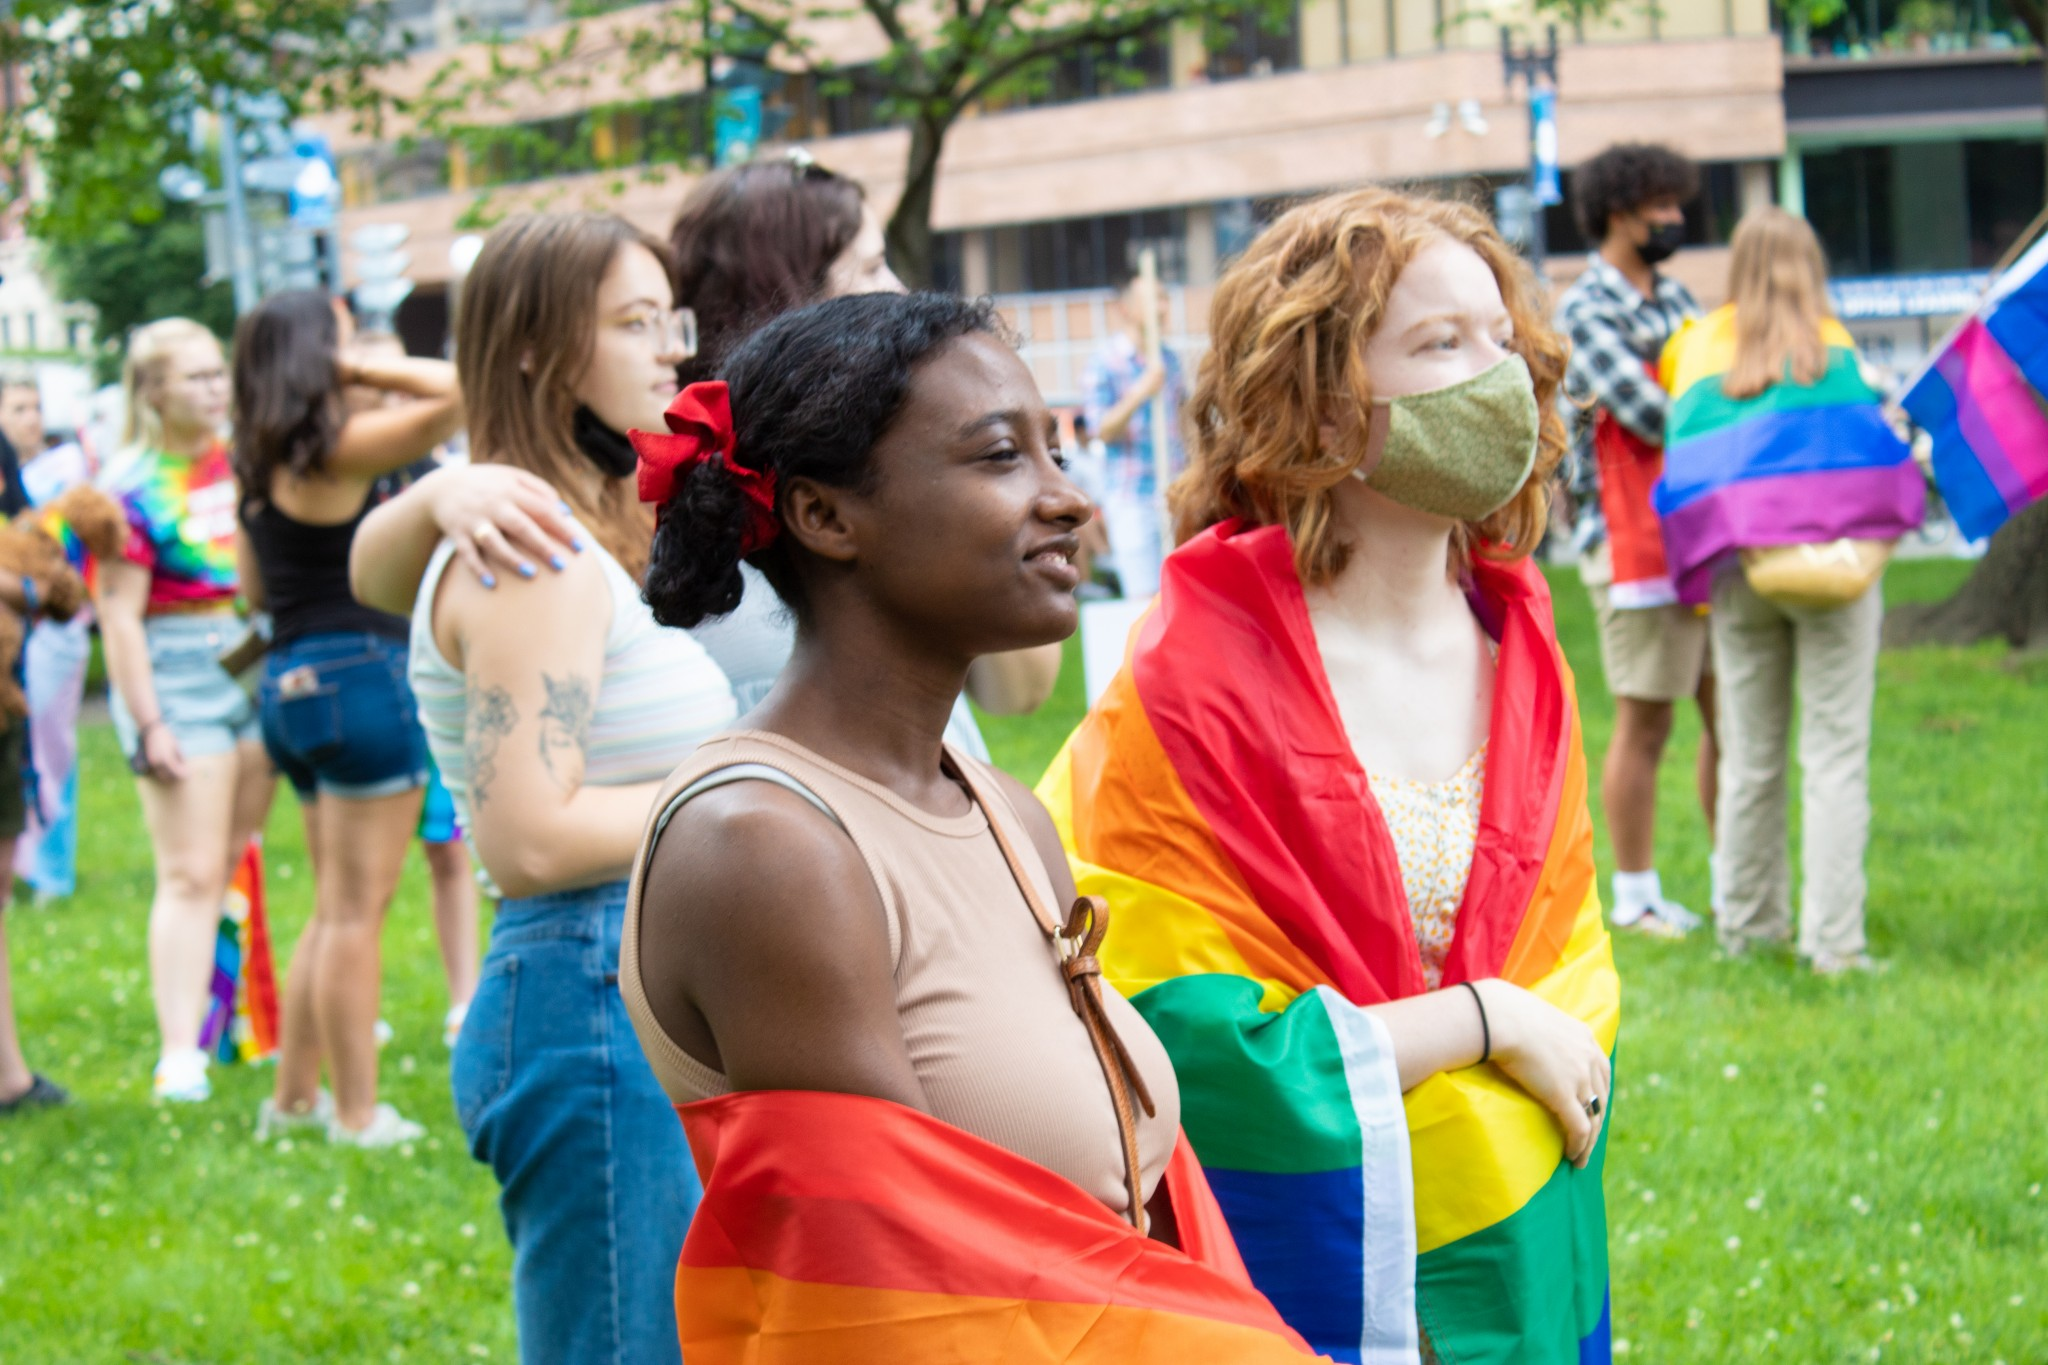 Children listen to speakers at Capital Pride's Walk & Rally, June 12, 2021 (The American Spectator)